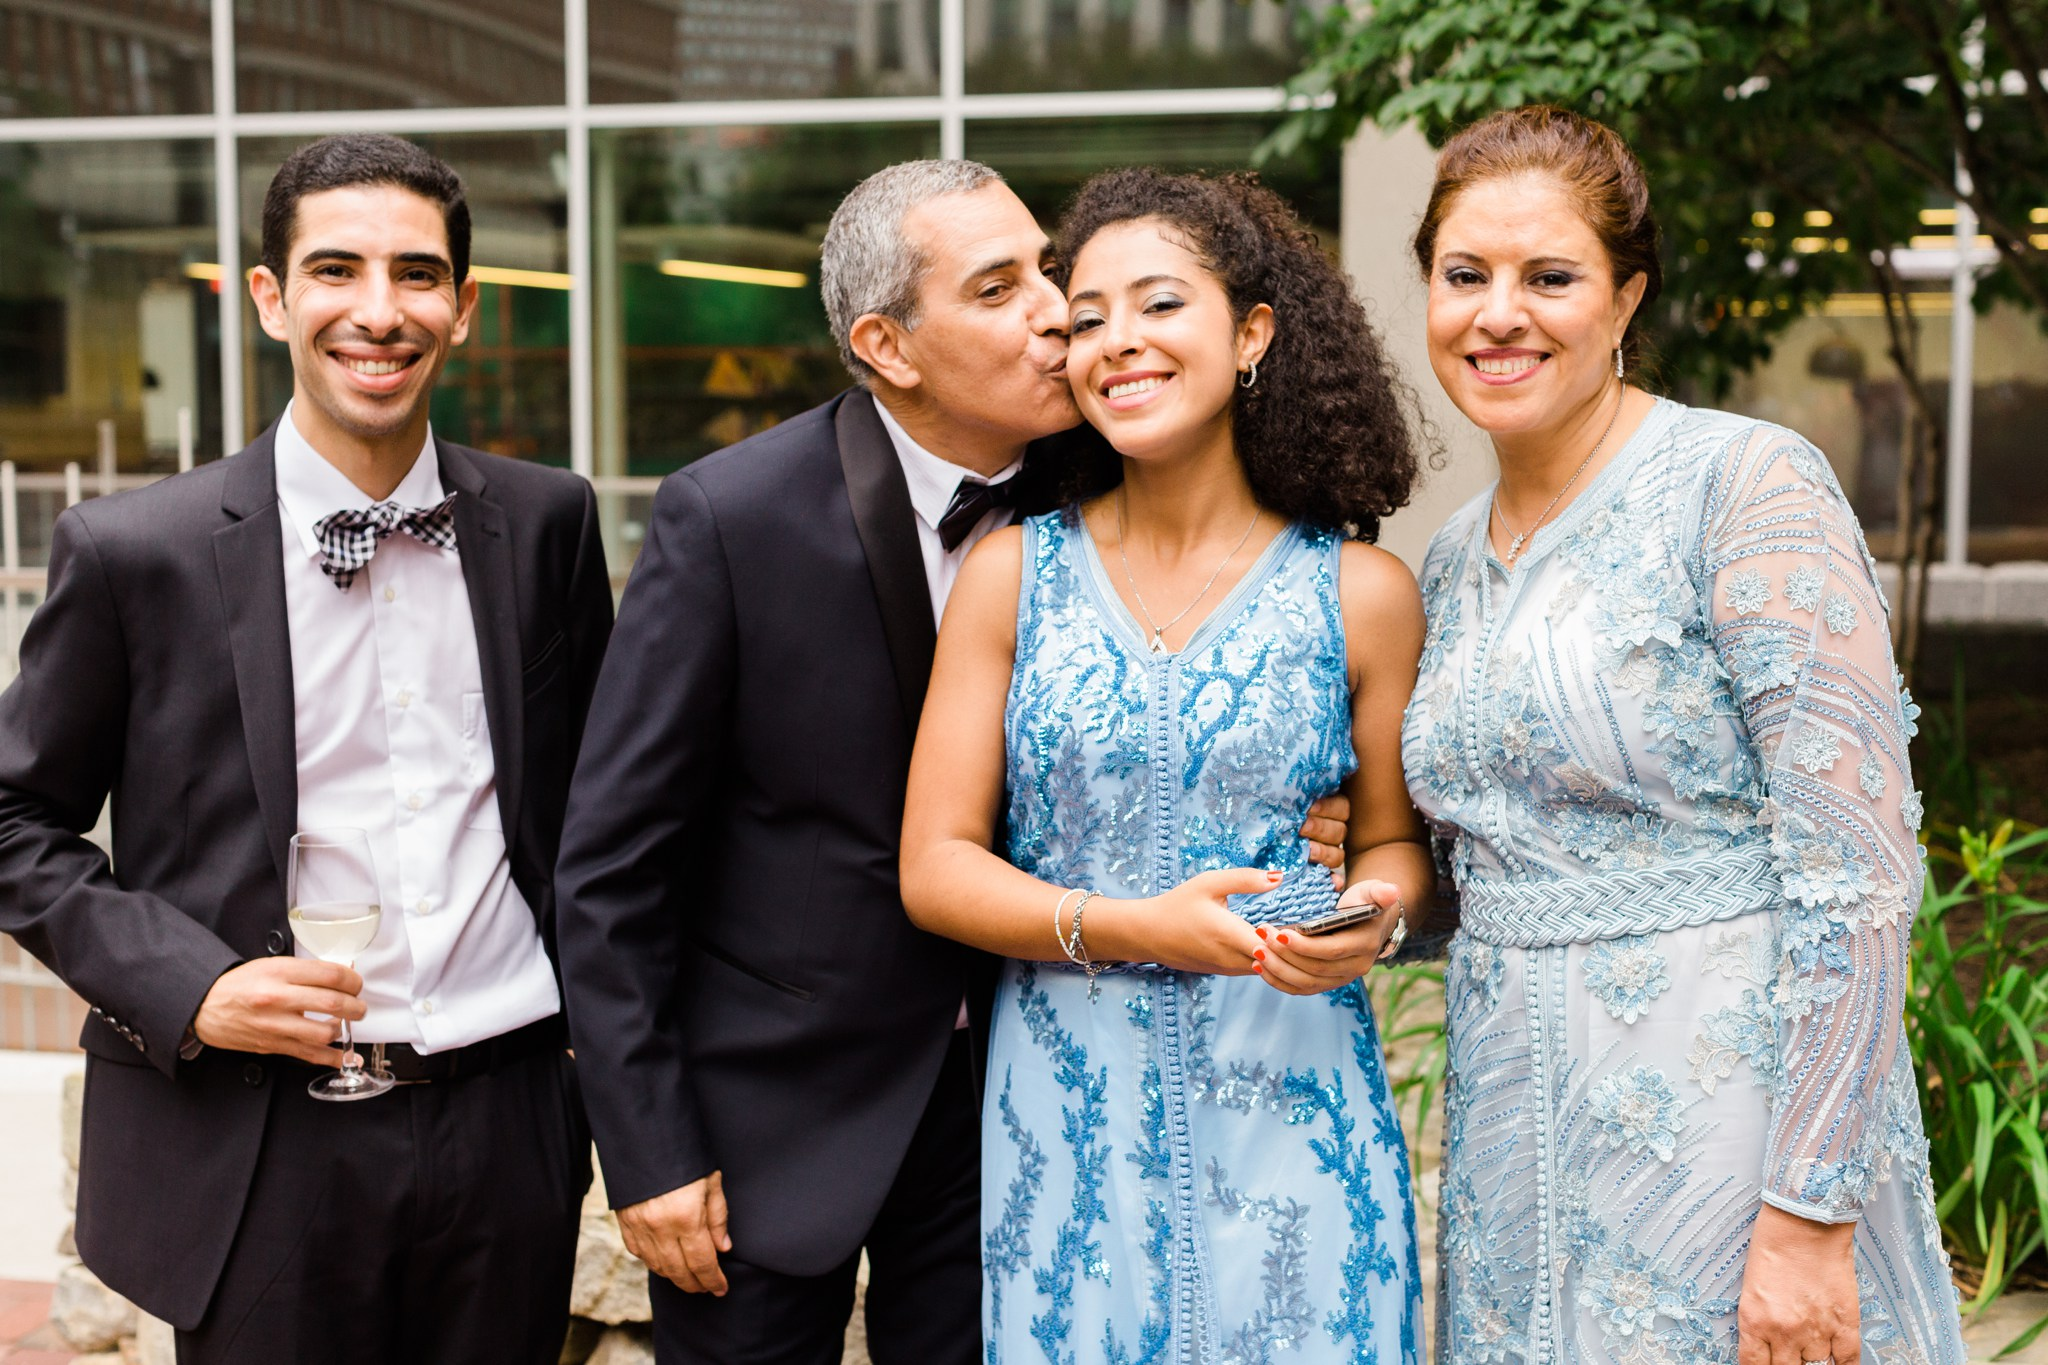 mandarin_oriental_boston_wedding_photos_00072.JPG